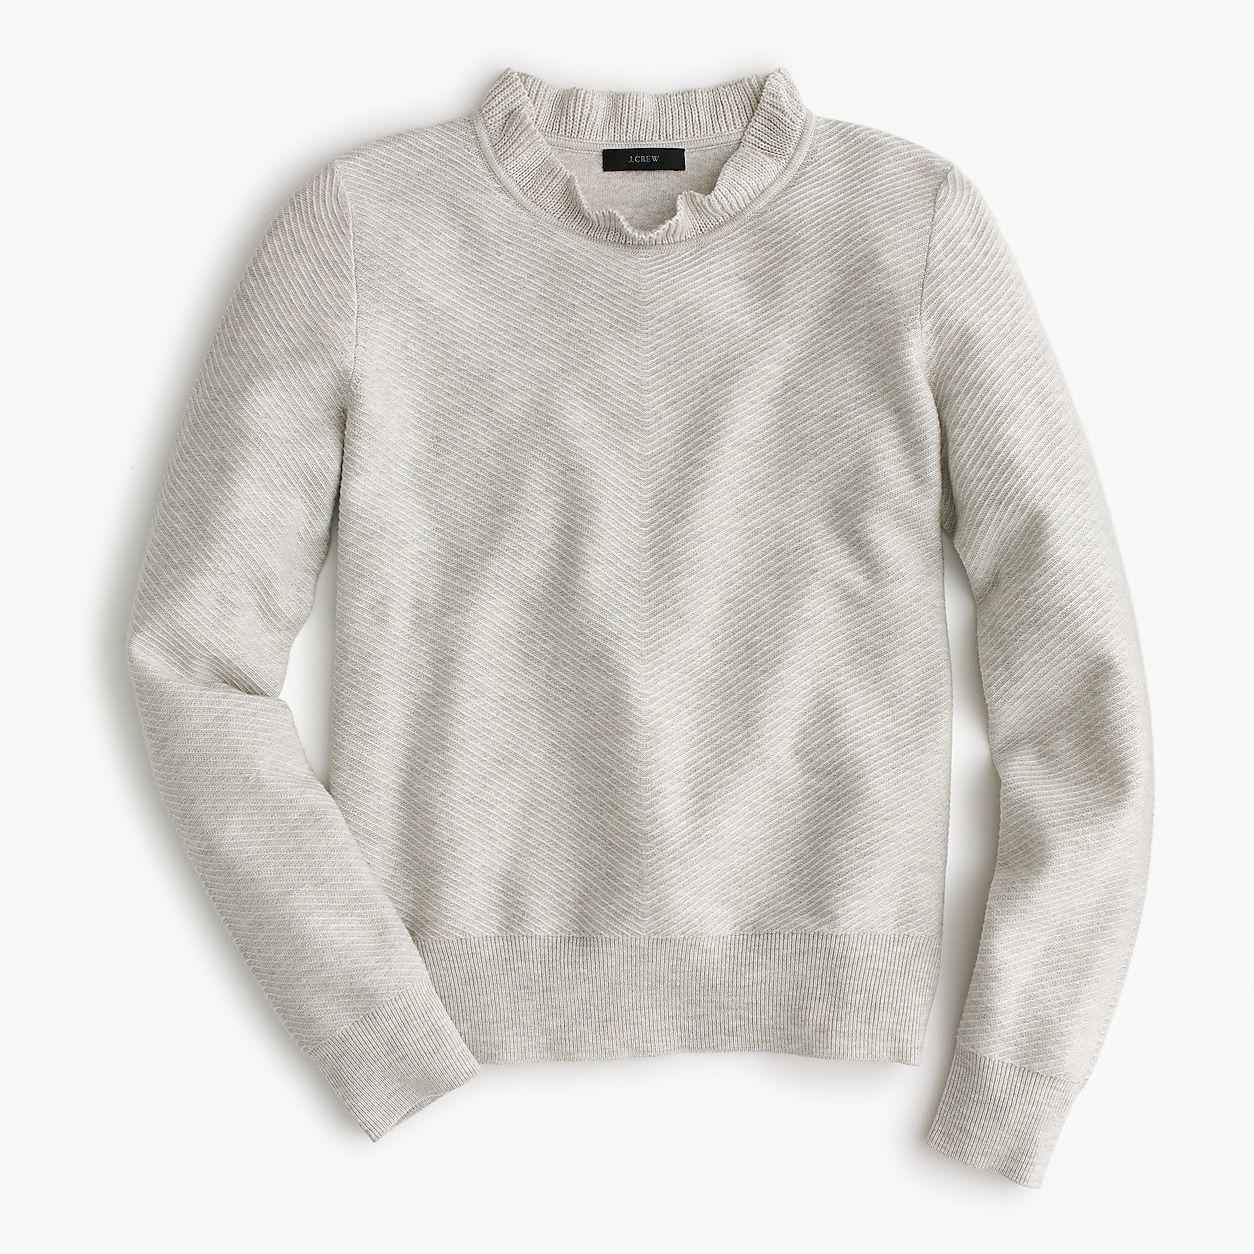 577b4a1f8f Ruffle-Neck Pullover Sweater